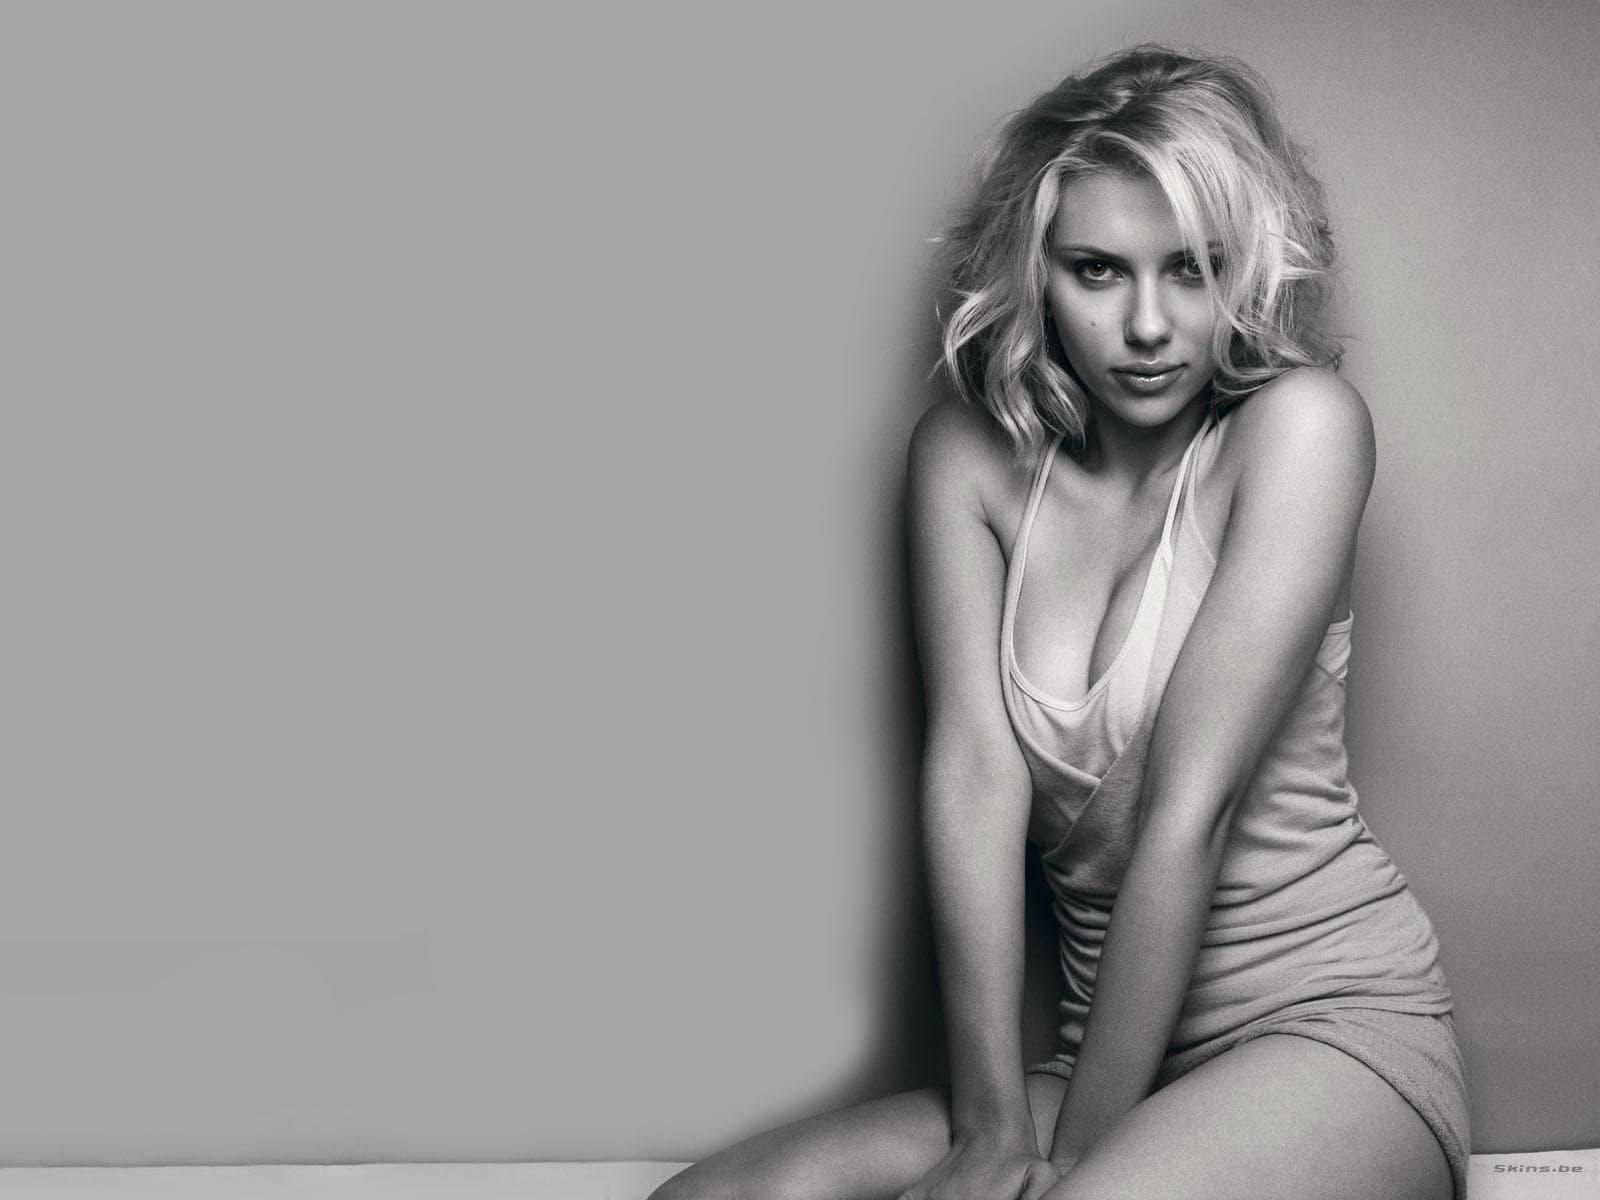 Scarlett Johansson widescreen wallpapers